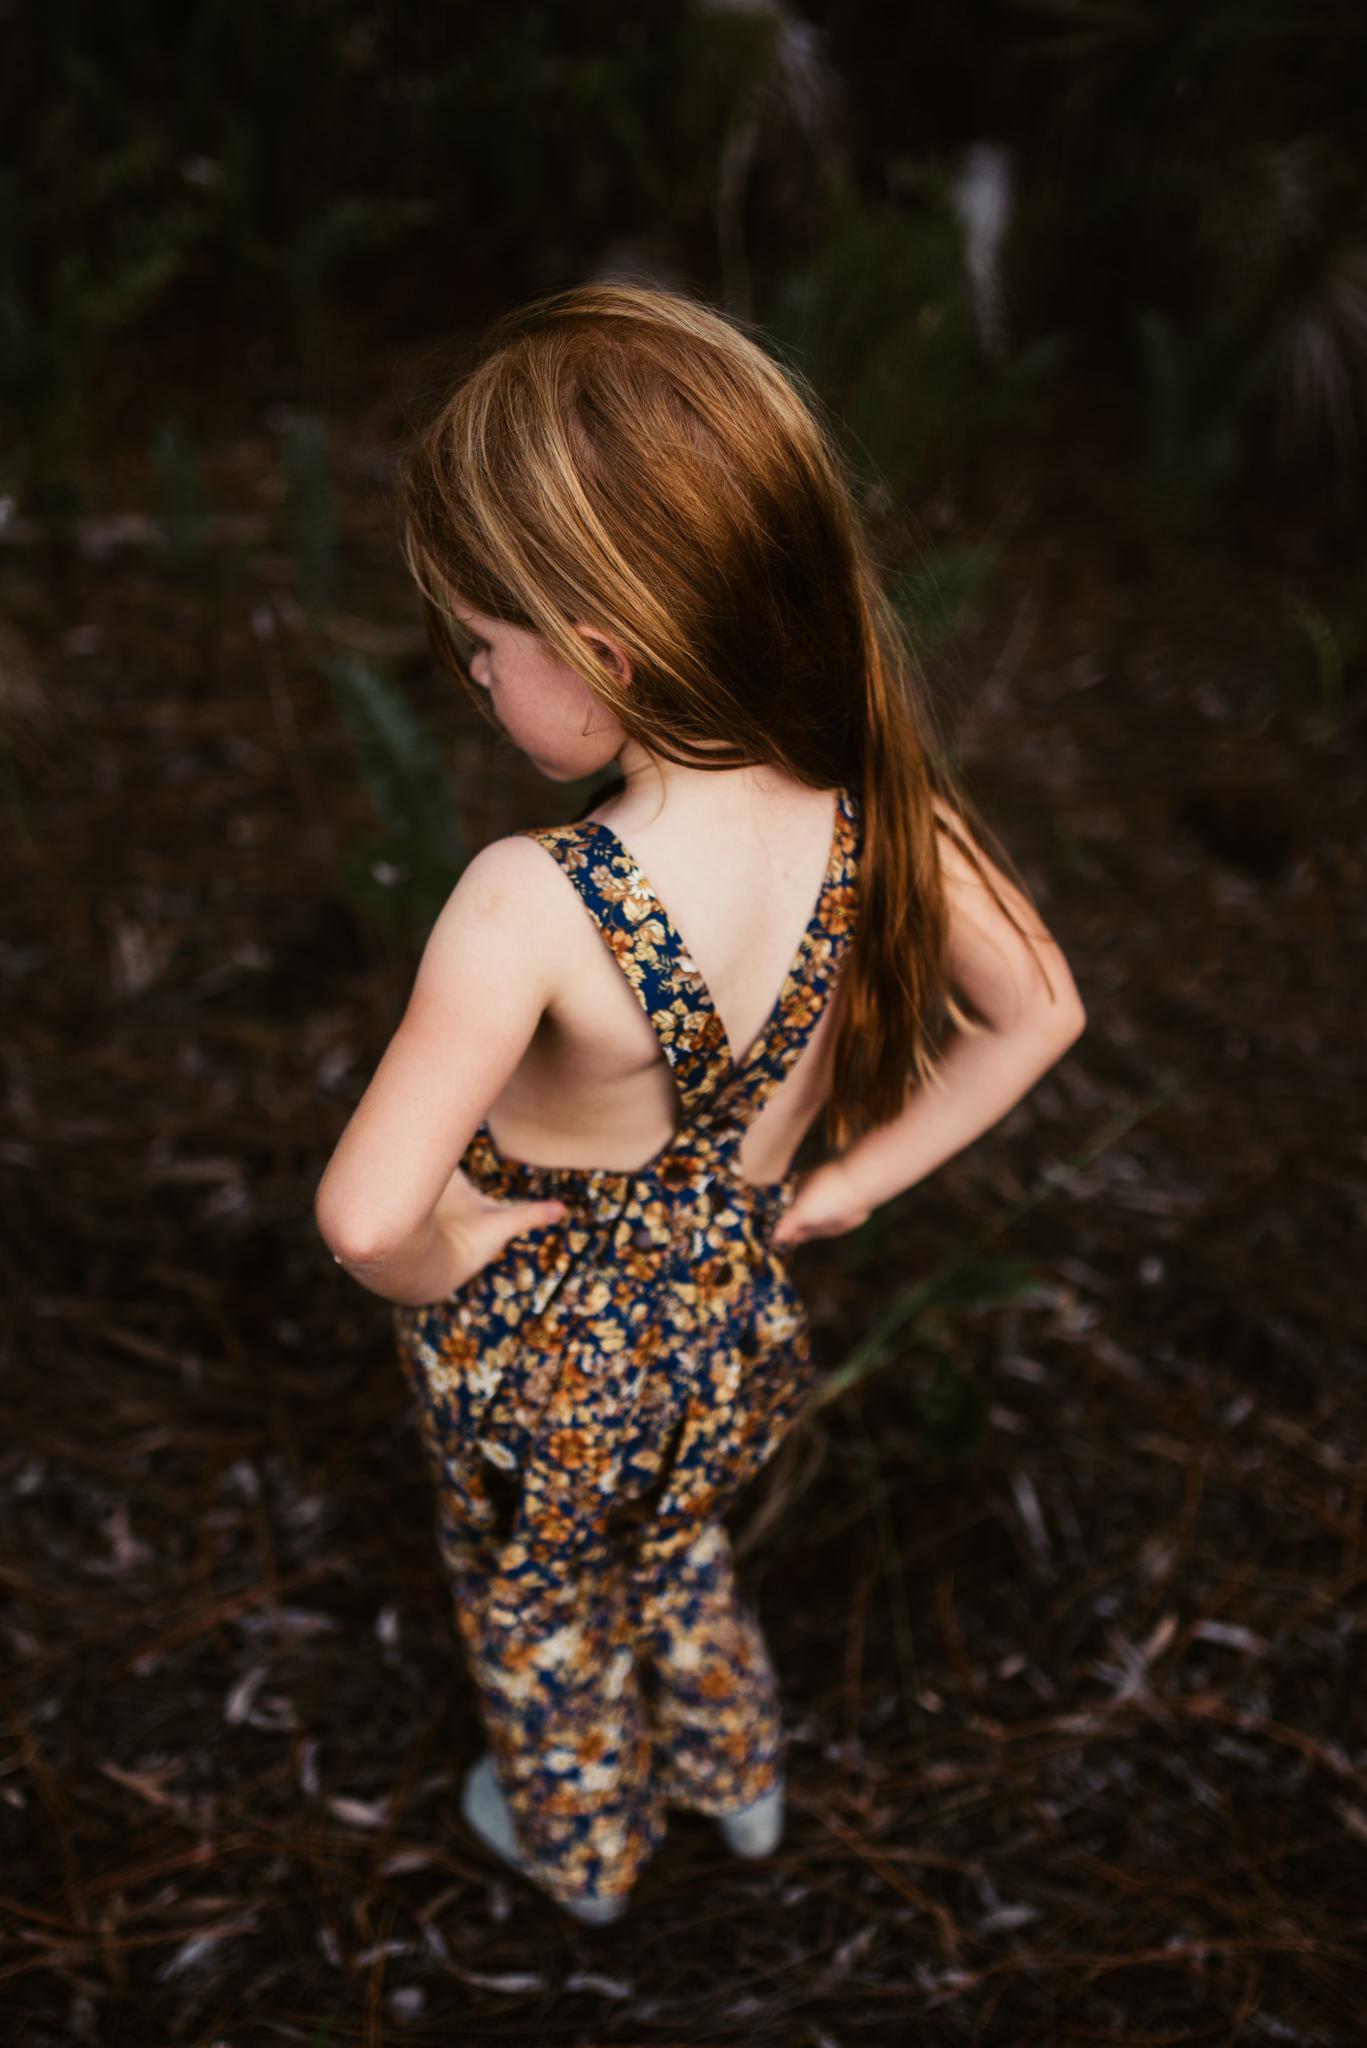 twyla jones photography - treasure coast florida - childrens adventure clothing commercial shoot--45.jpg